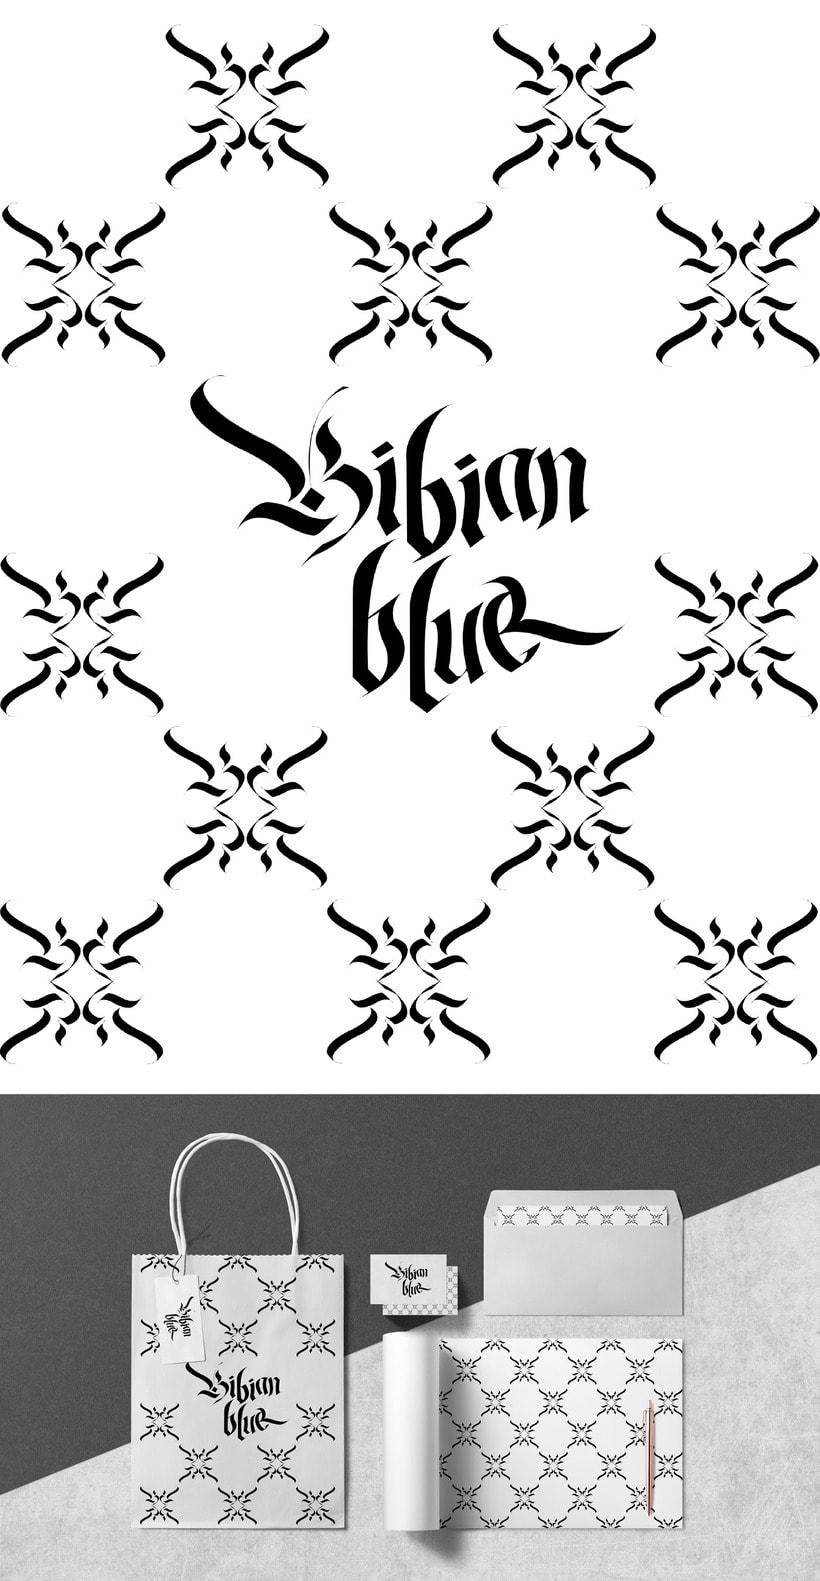 Bibian Blue 0